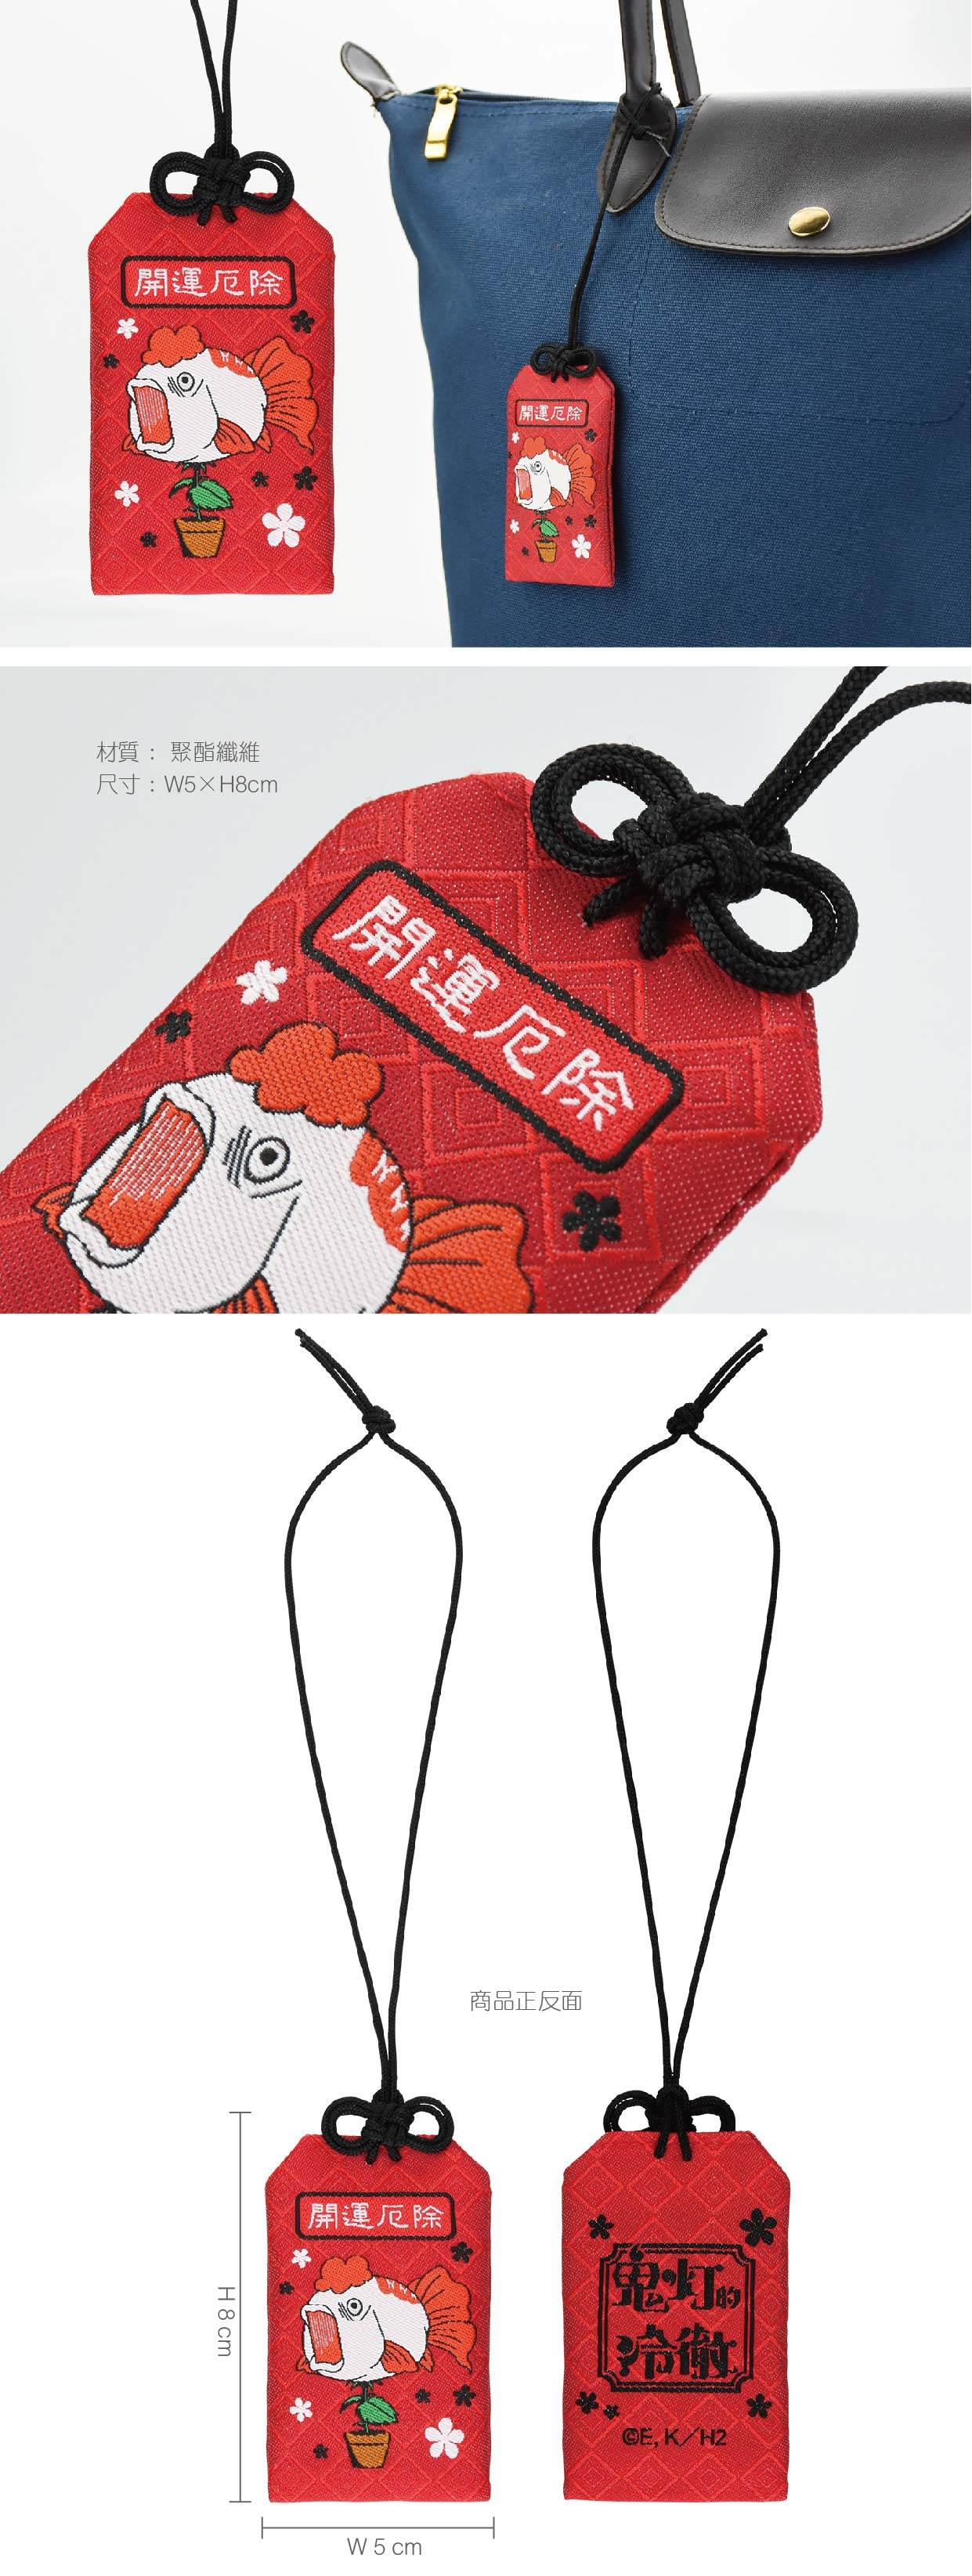 http://products.fukang.com.tw/4712926852910.jpg